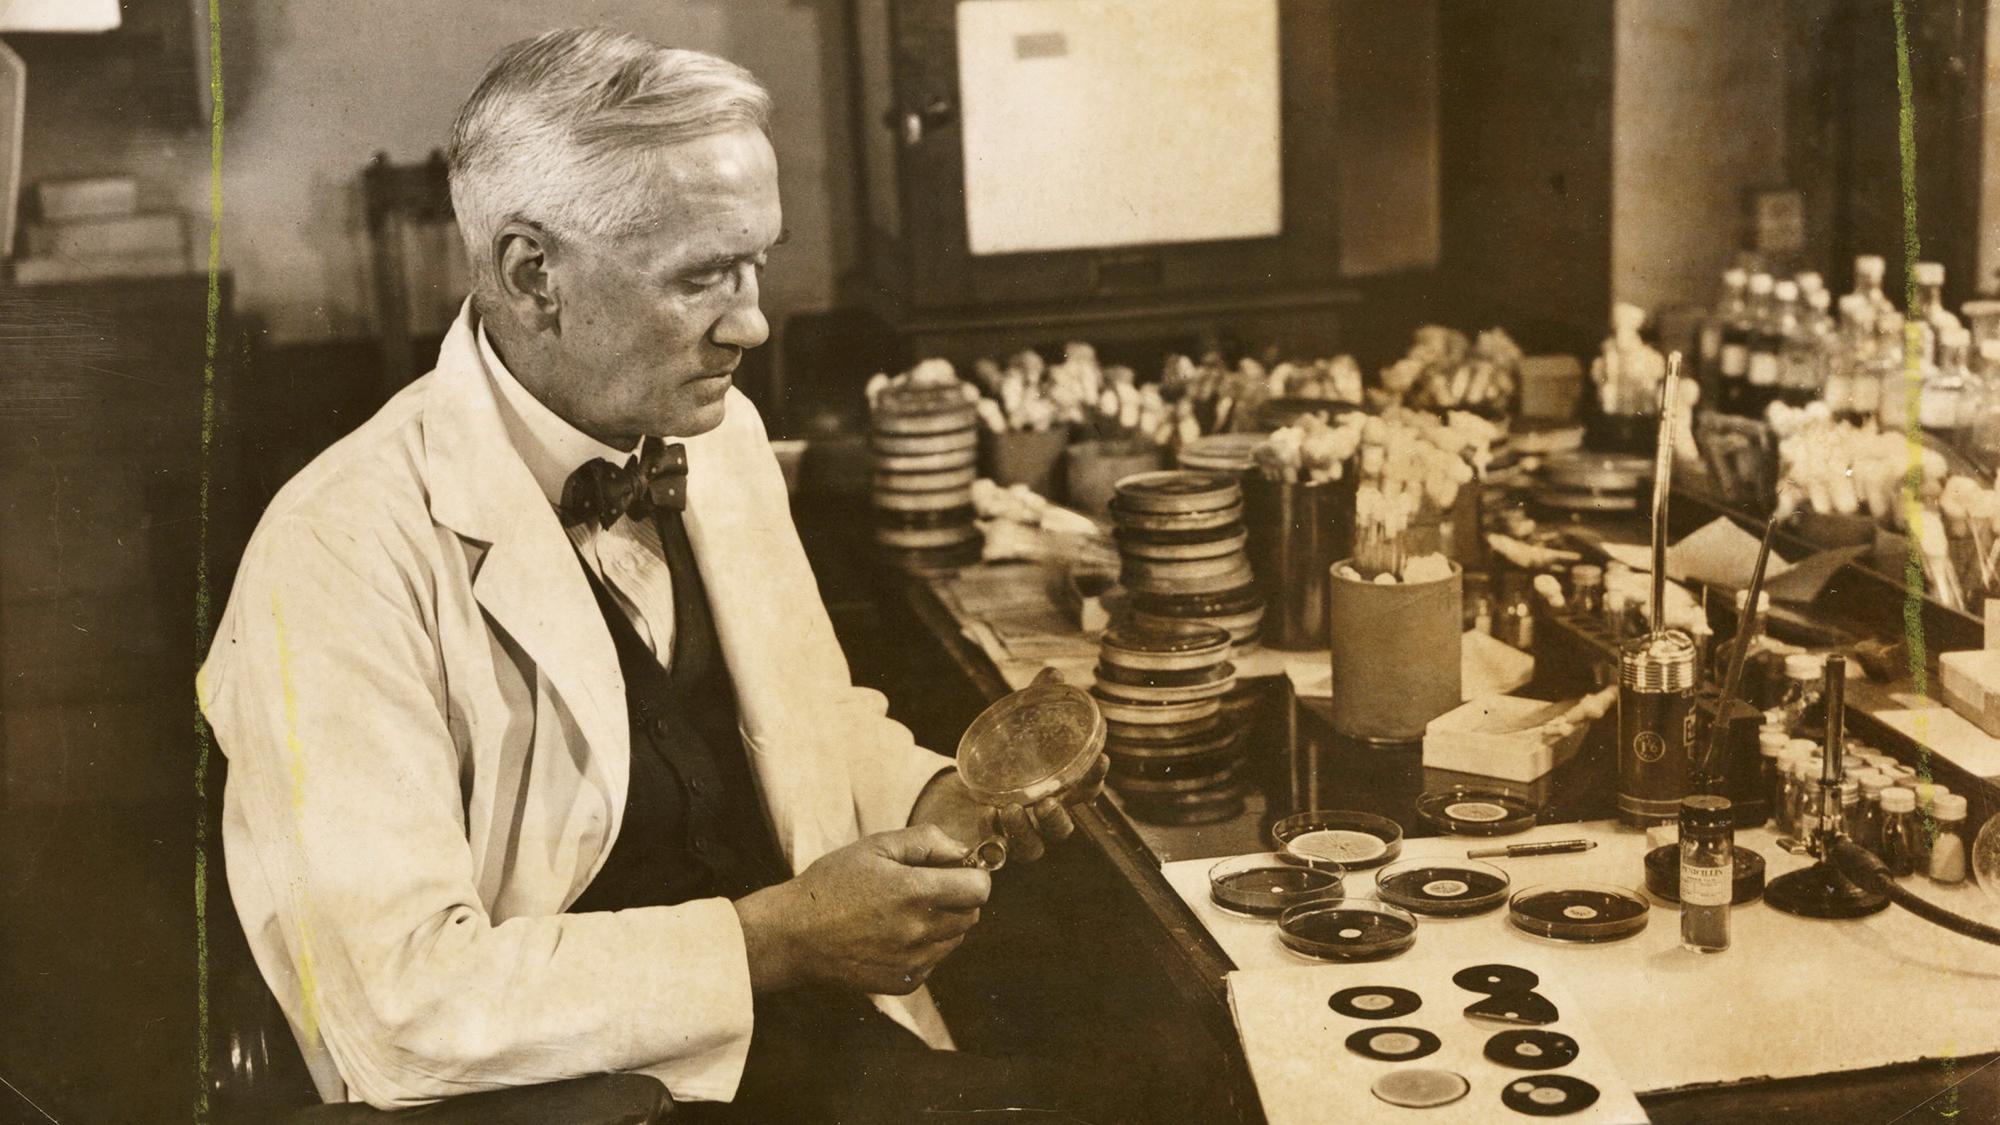 UNITED KINGDOM - JUNE 02:  Professor Fleming working in his laboratory, 1943. A photograph of Professor Alexander Fleming [18